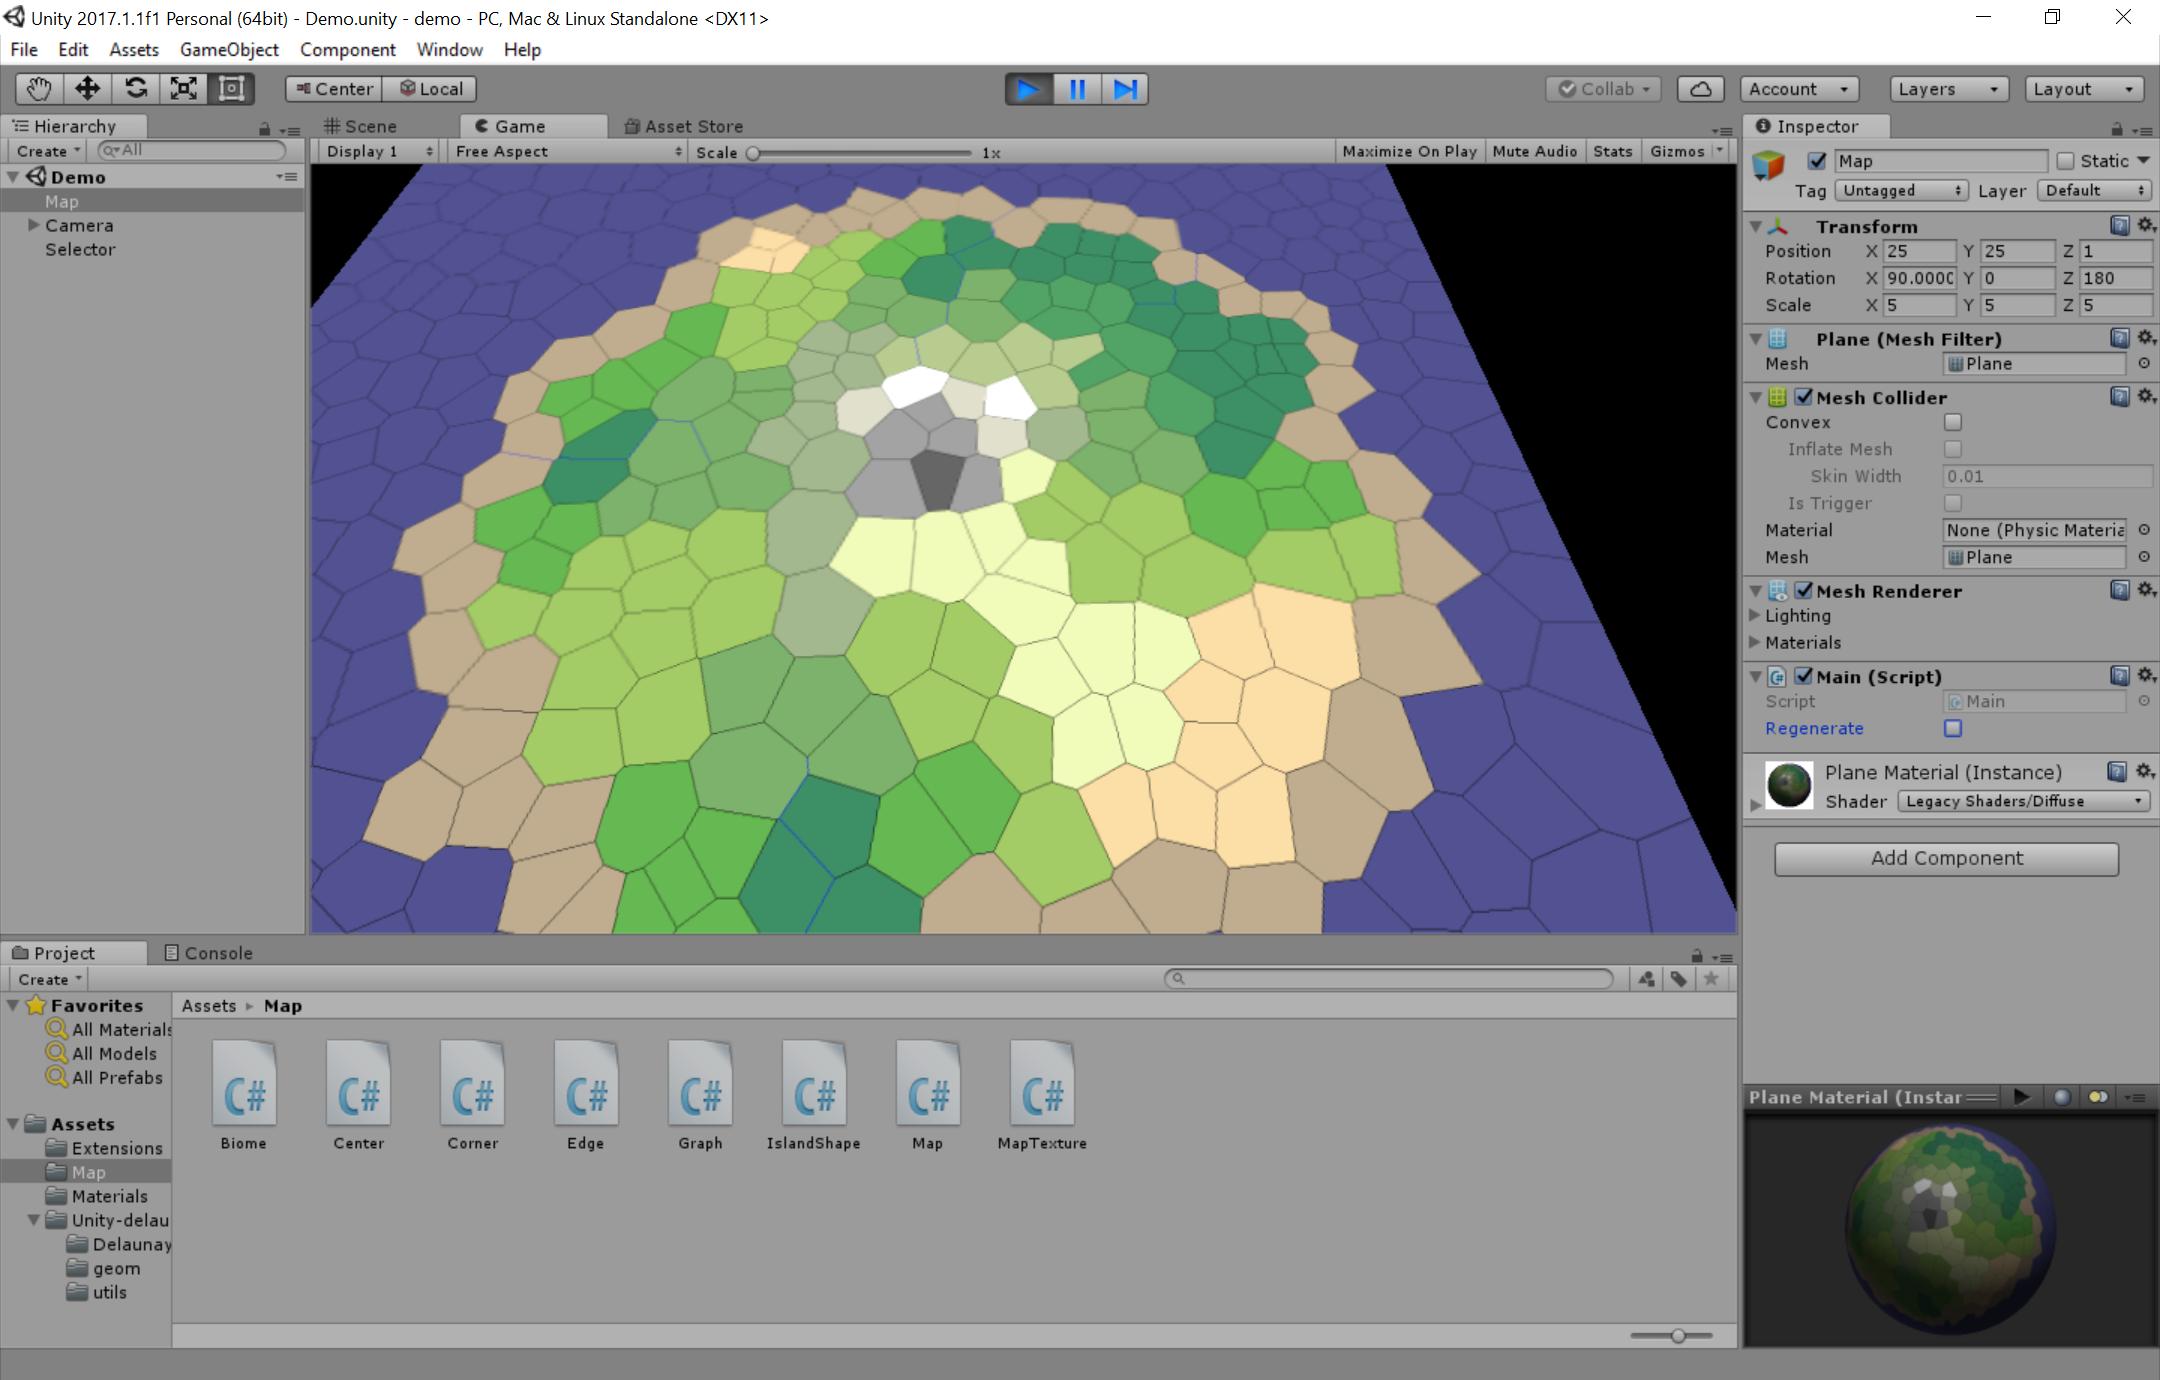 polygon-map-unity by staff0rd